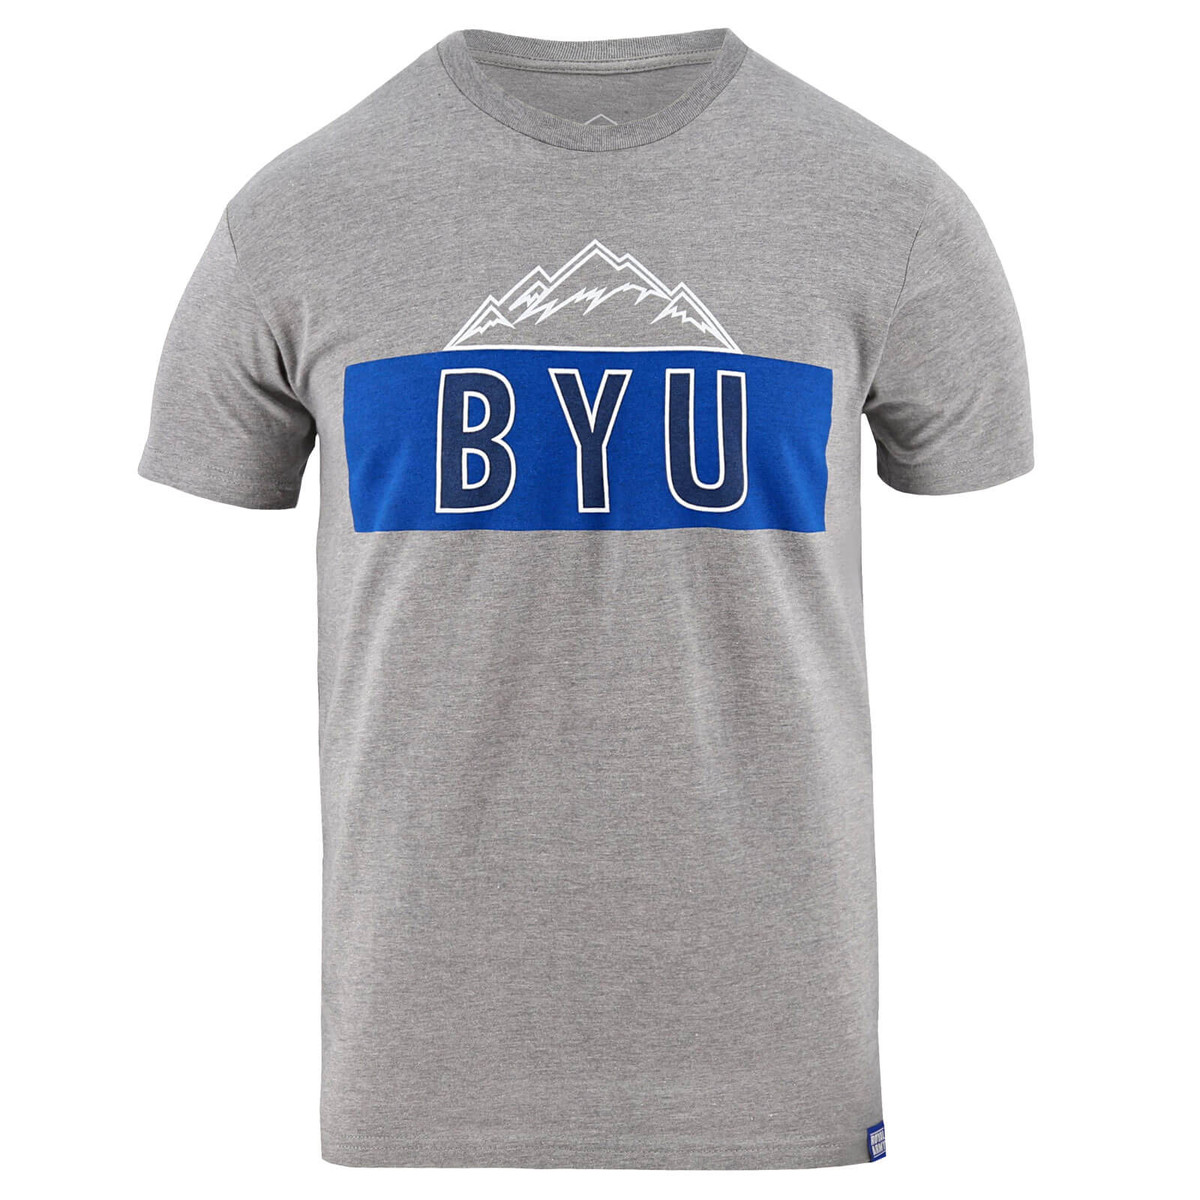 230b847cb Men's T-Shirts